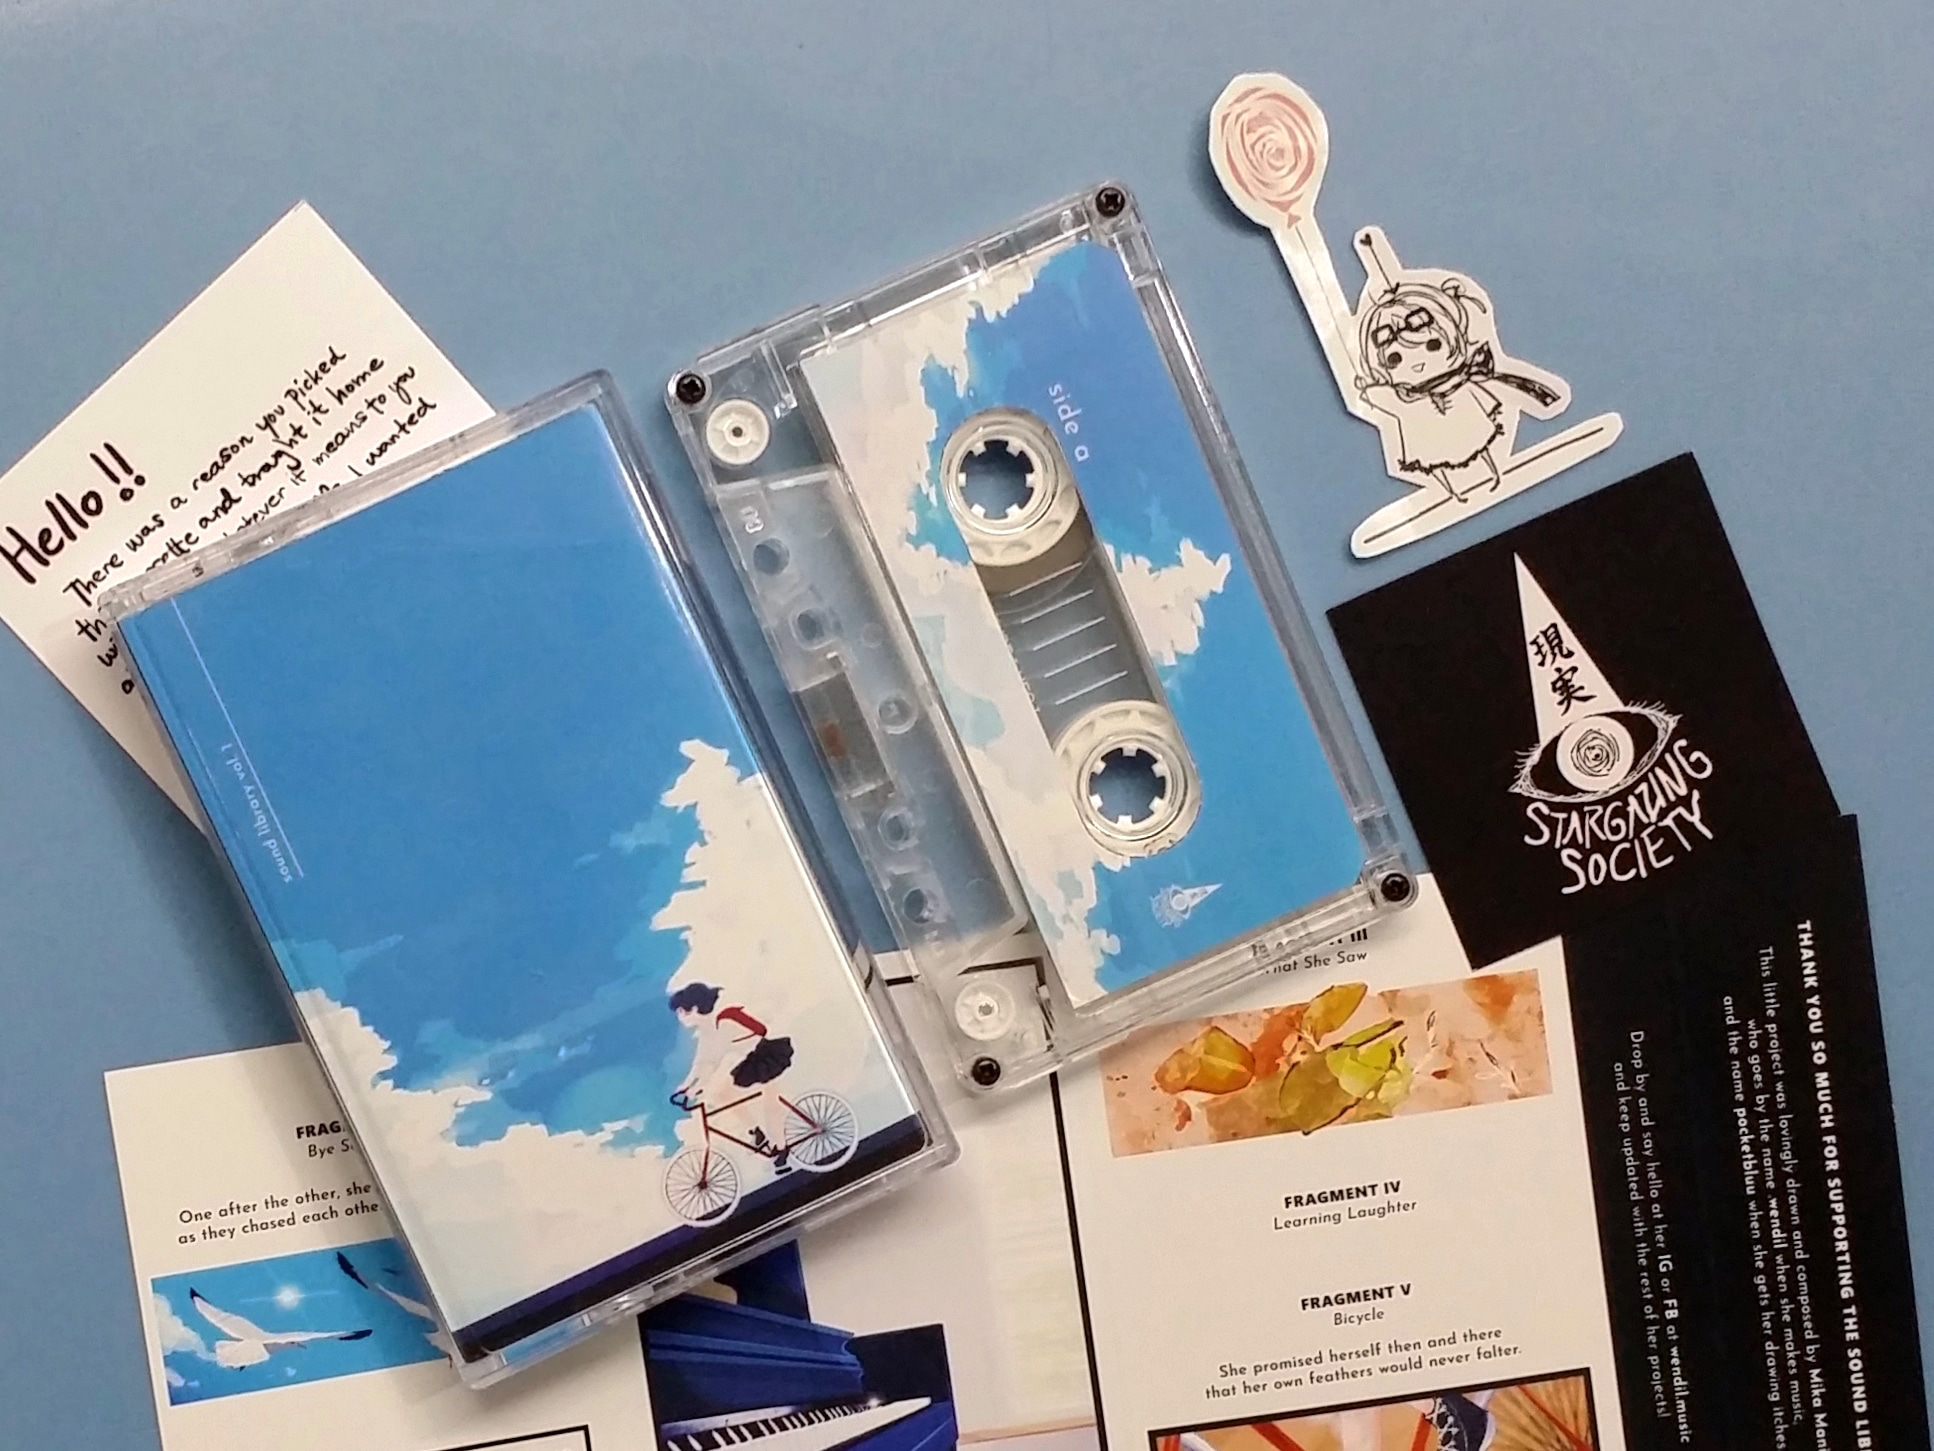 [SOLD] .wendil - Sound Library Vol. 1: Lena and the Seagull (Genjitsu Stargazing Society)